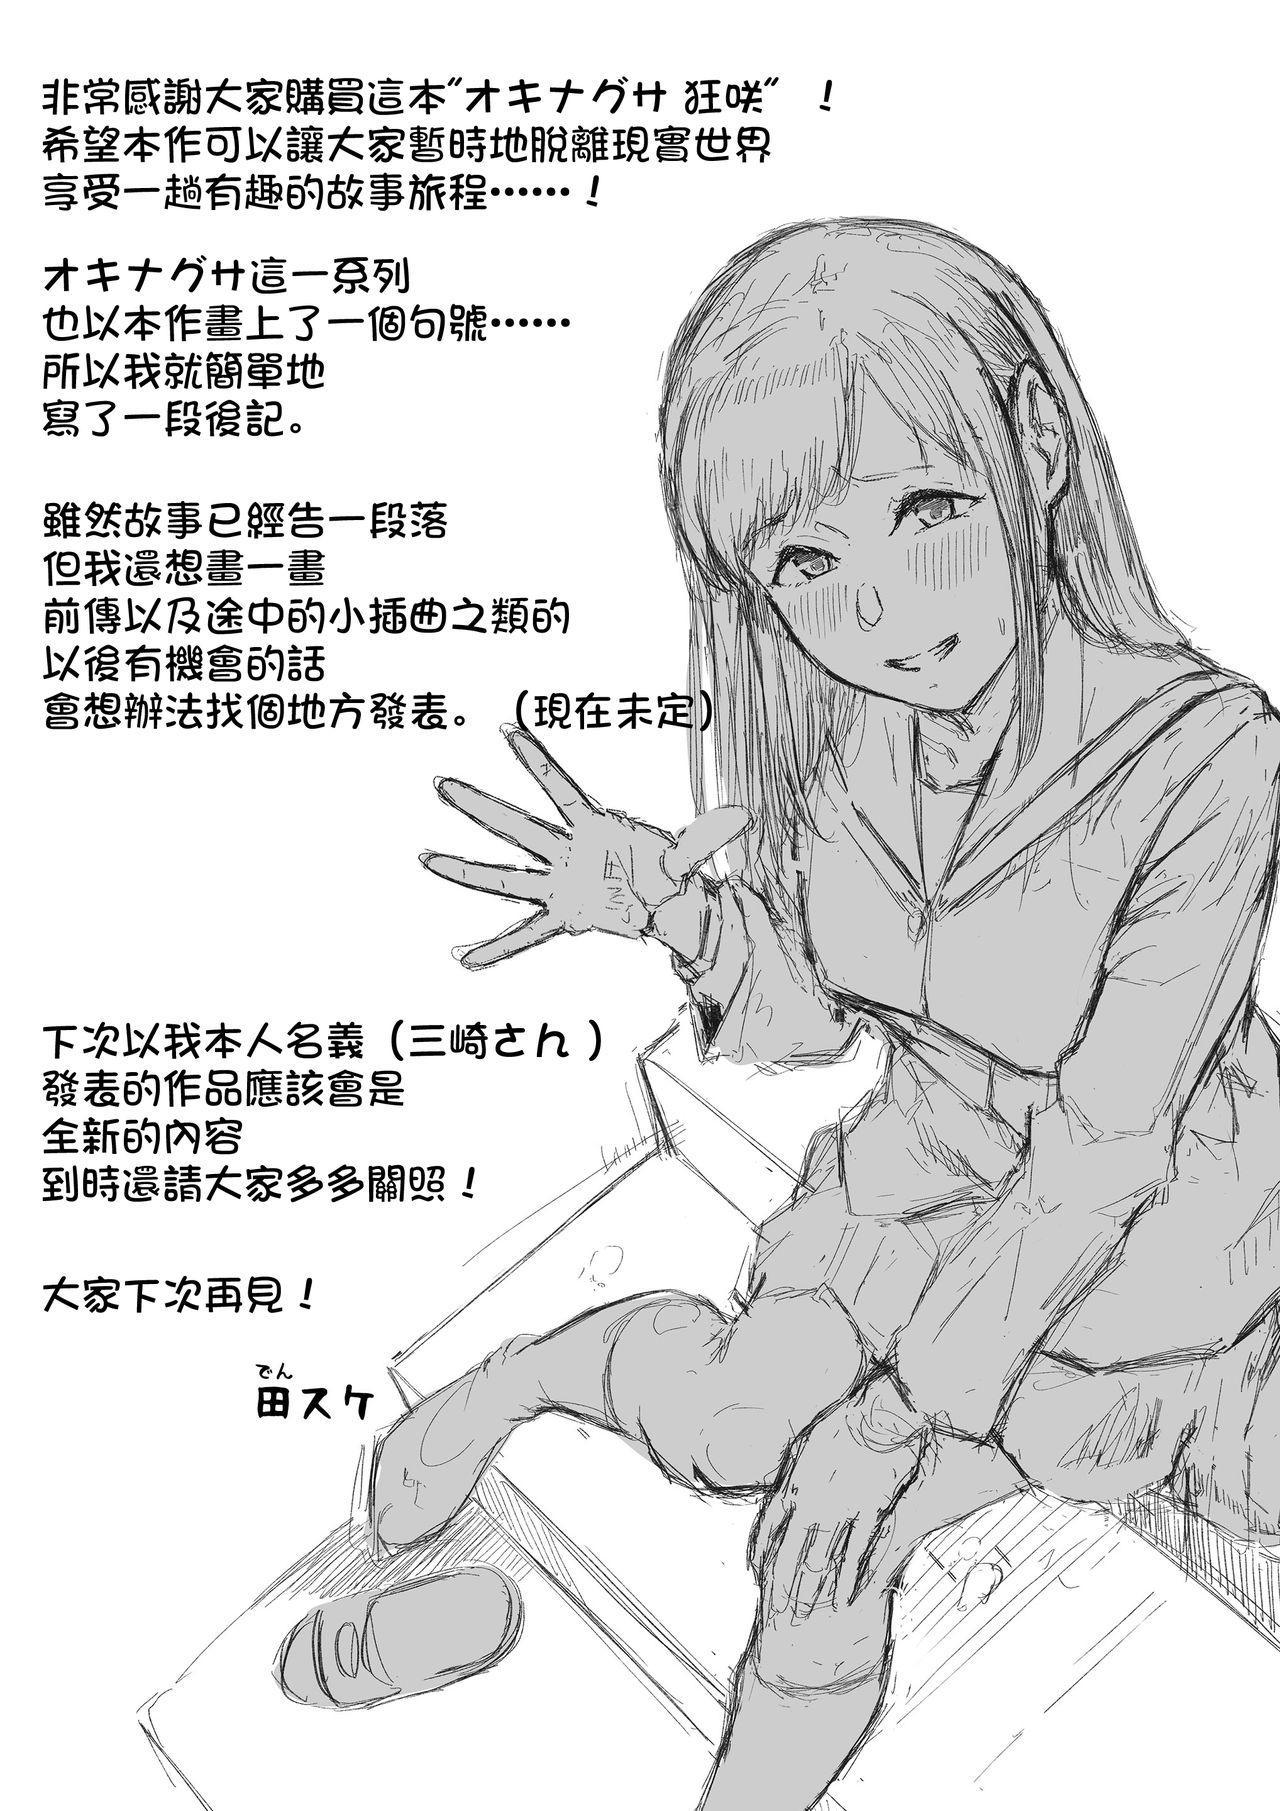 Okinagusa Kuru Saki 45